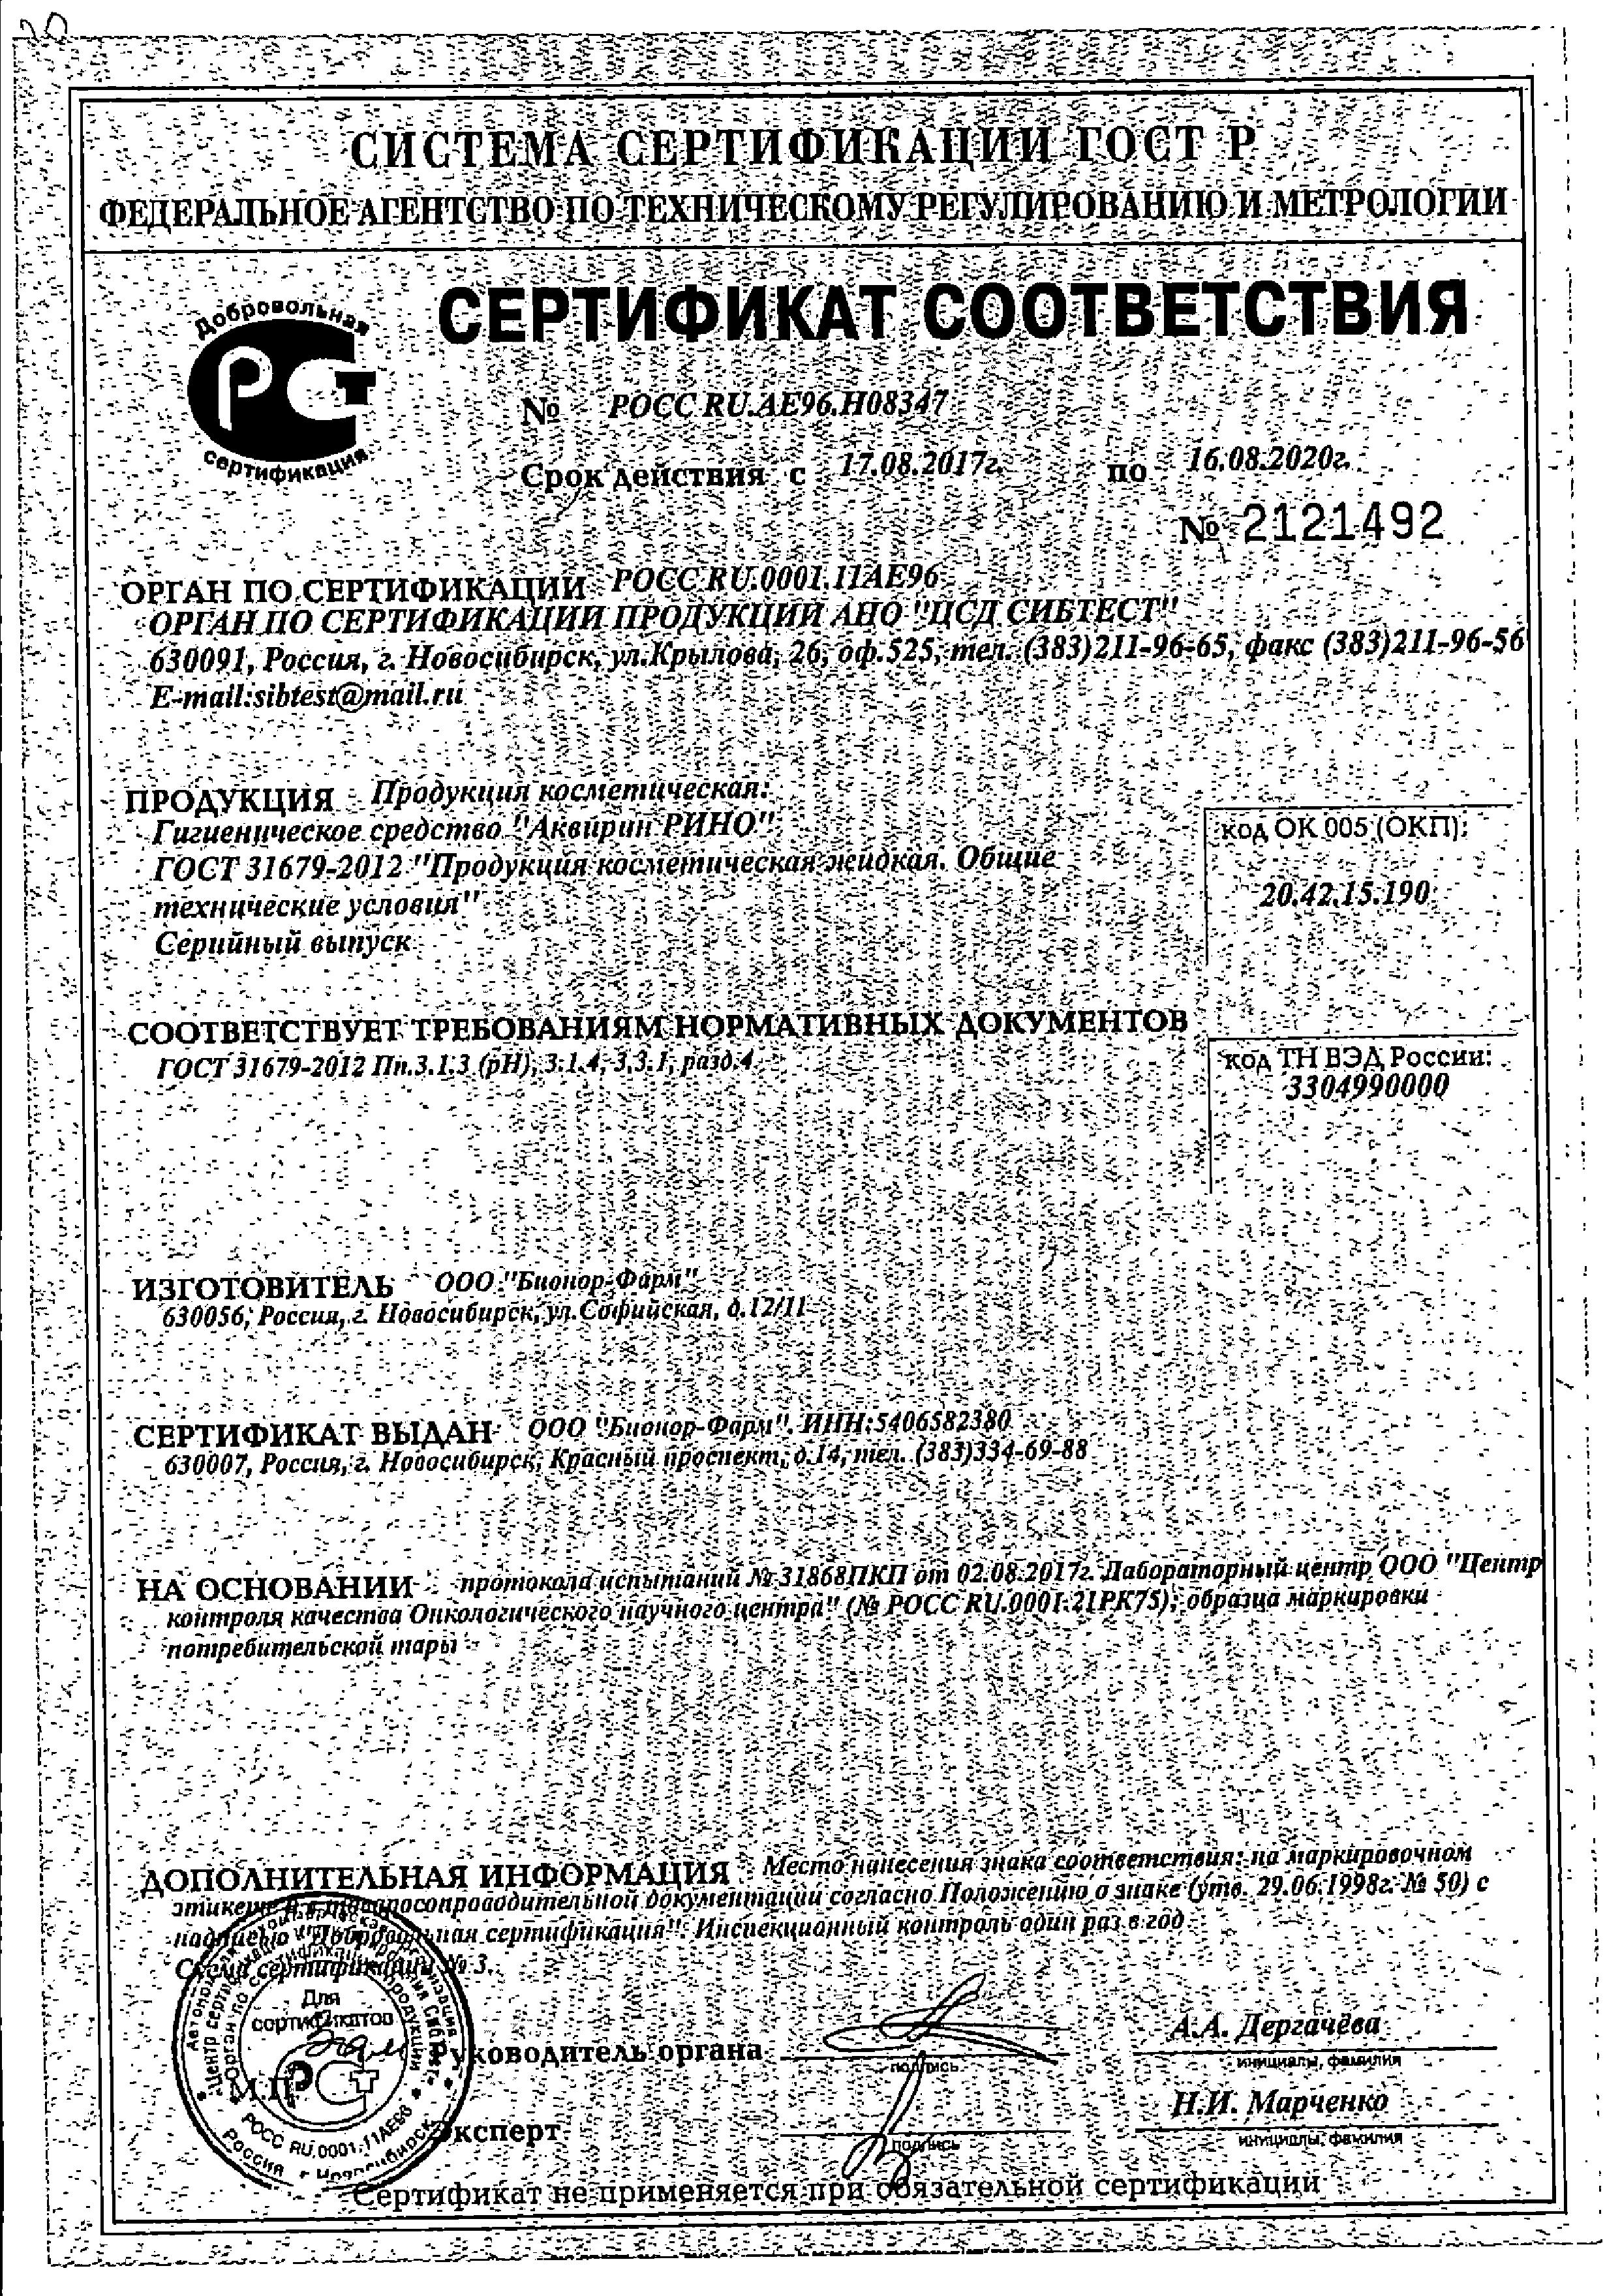 Аквирин Рино сертификат